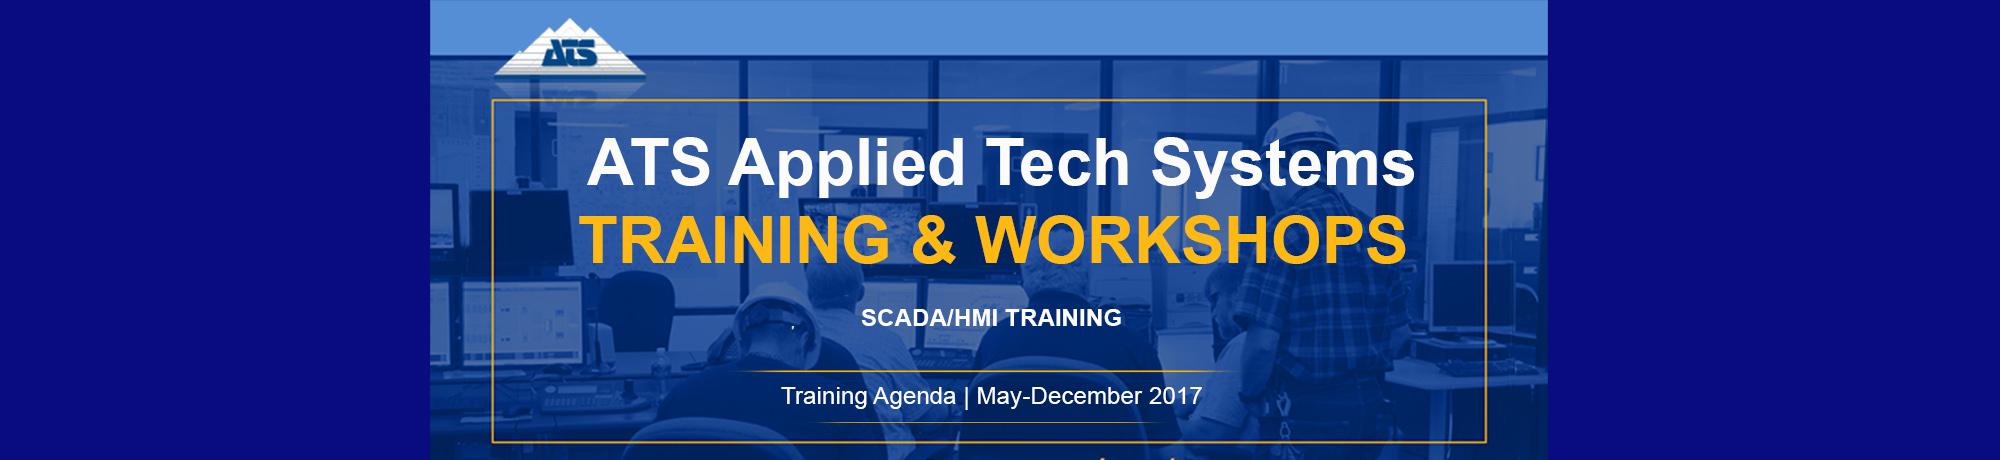 ATS Applied Tech Systems Training - SCADA/HMI Training